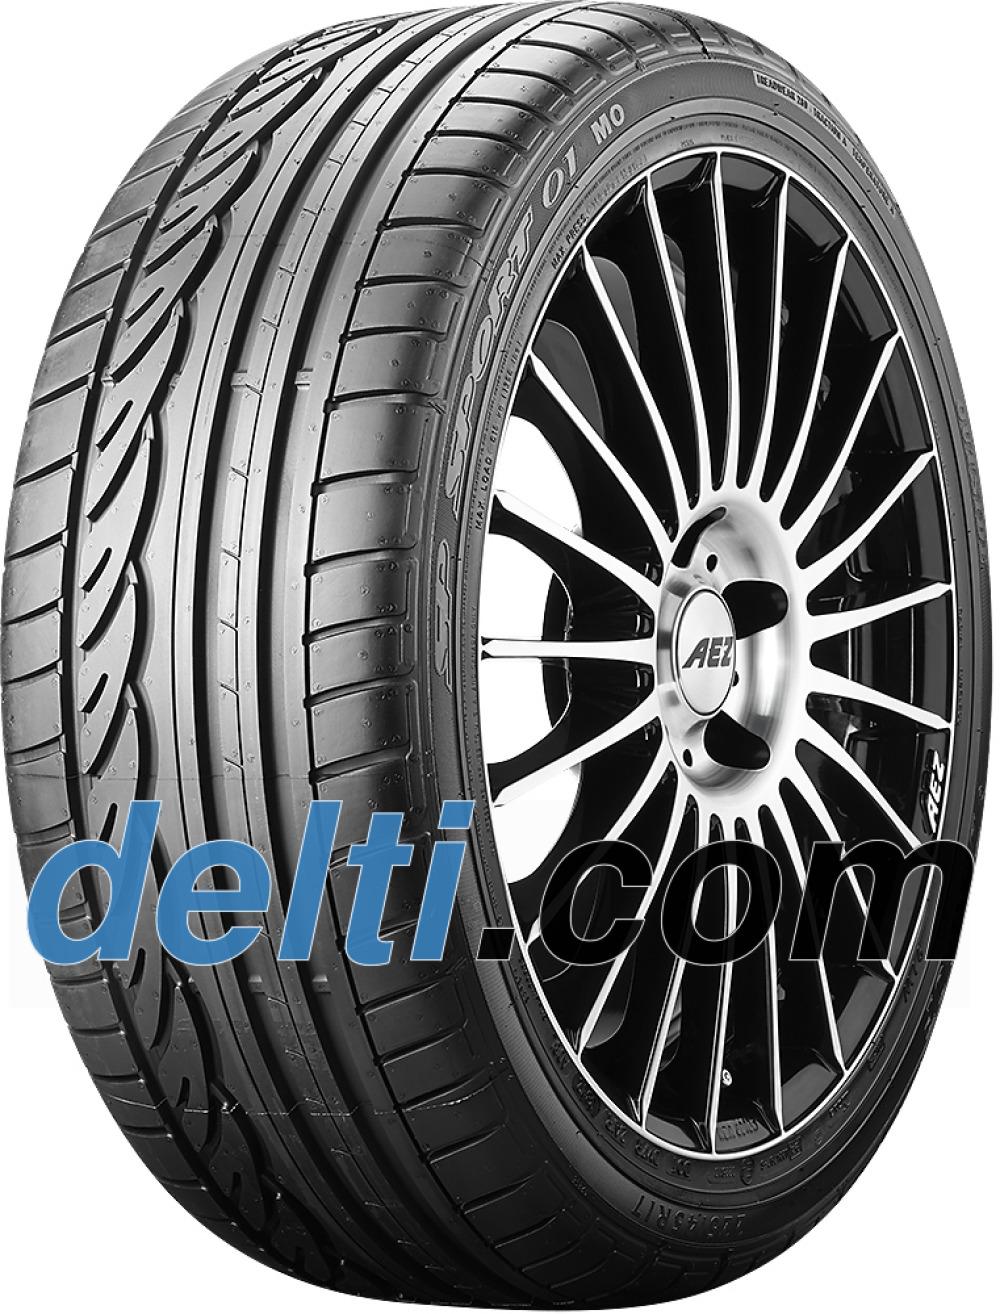 Dunlop SP Sport 01 DSST ( 275/30 R20 93Y *, avec protège-jante (MFS), runflat )